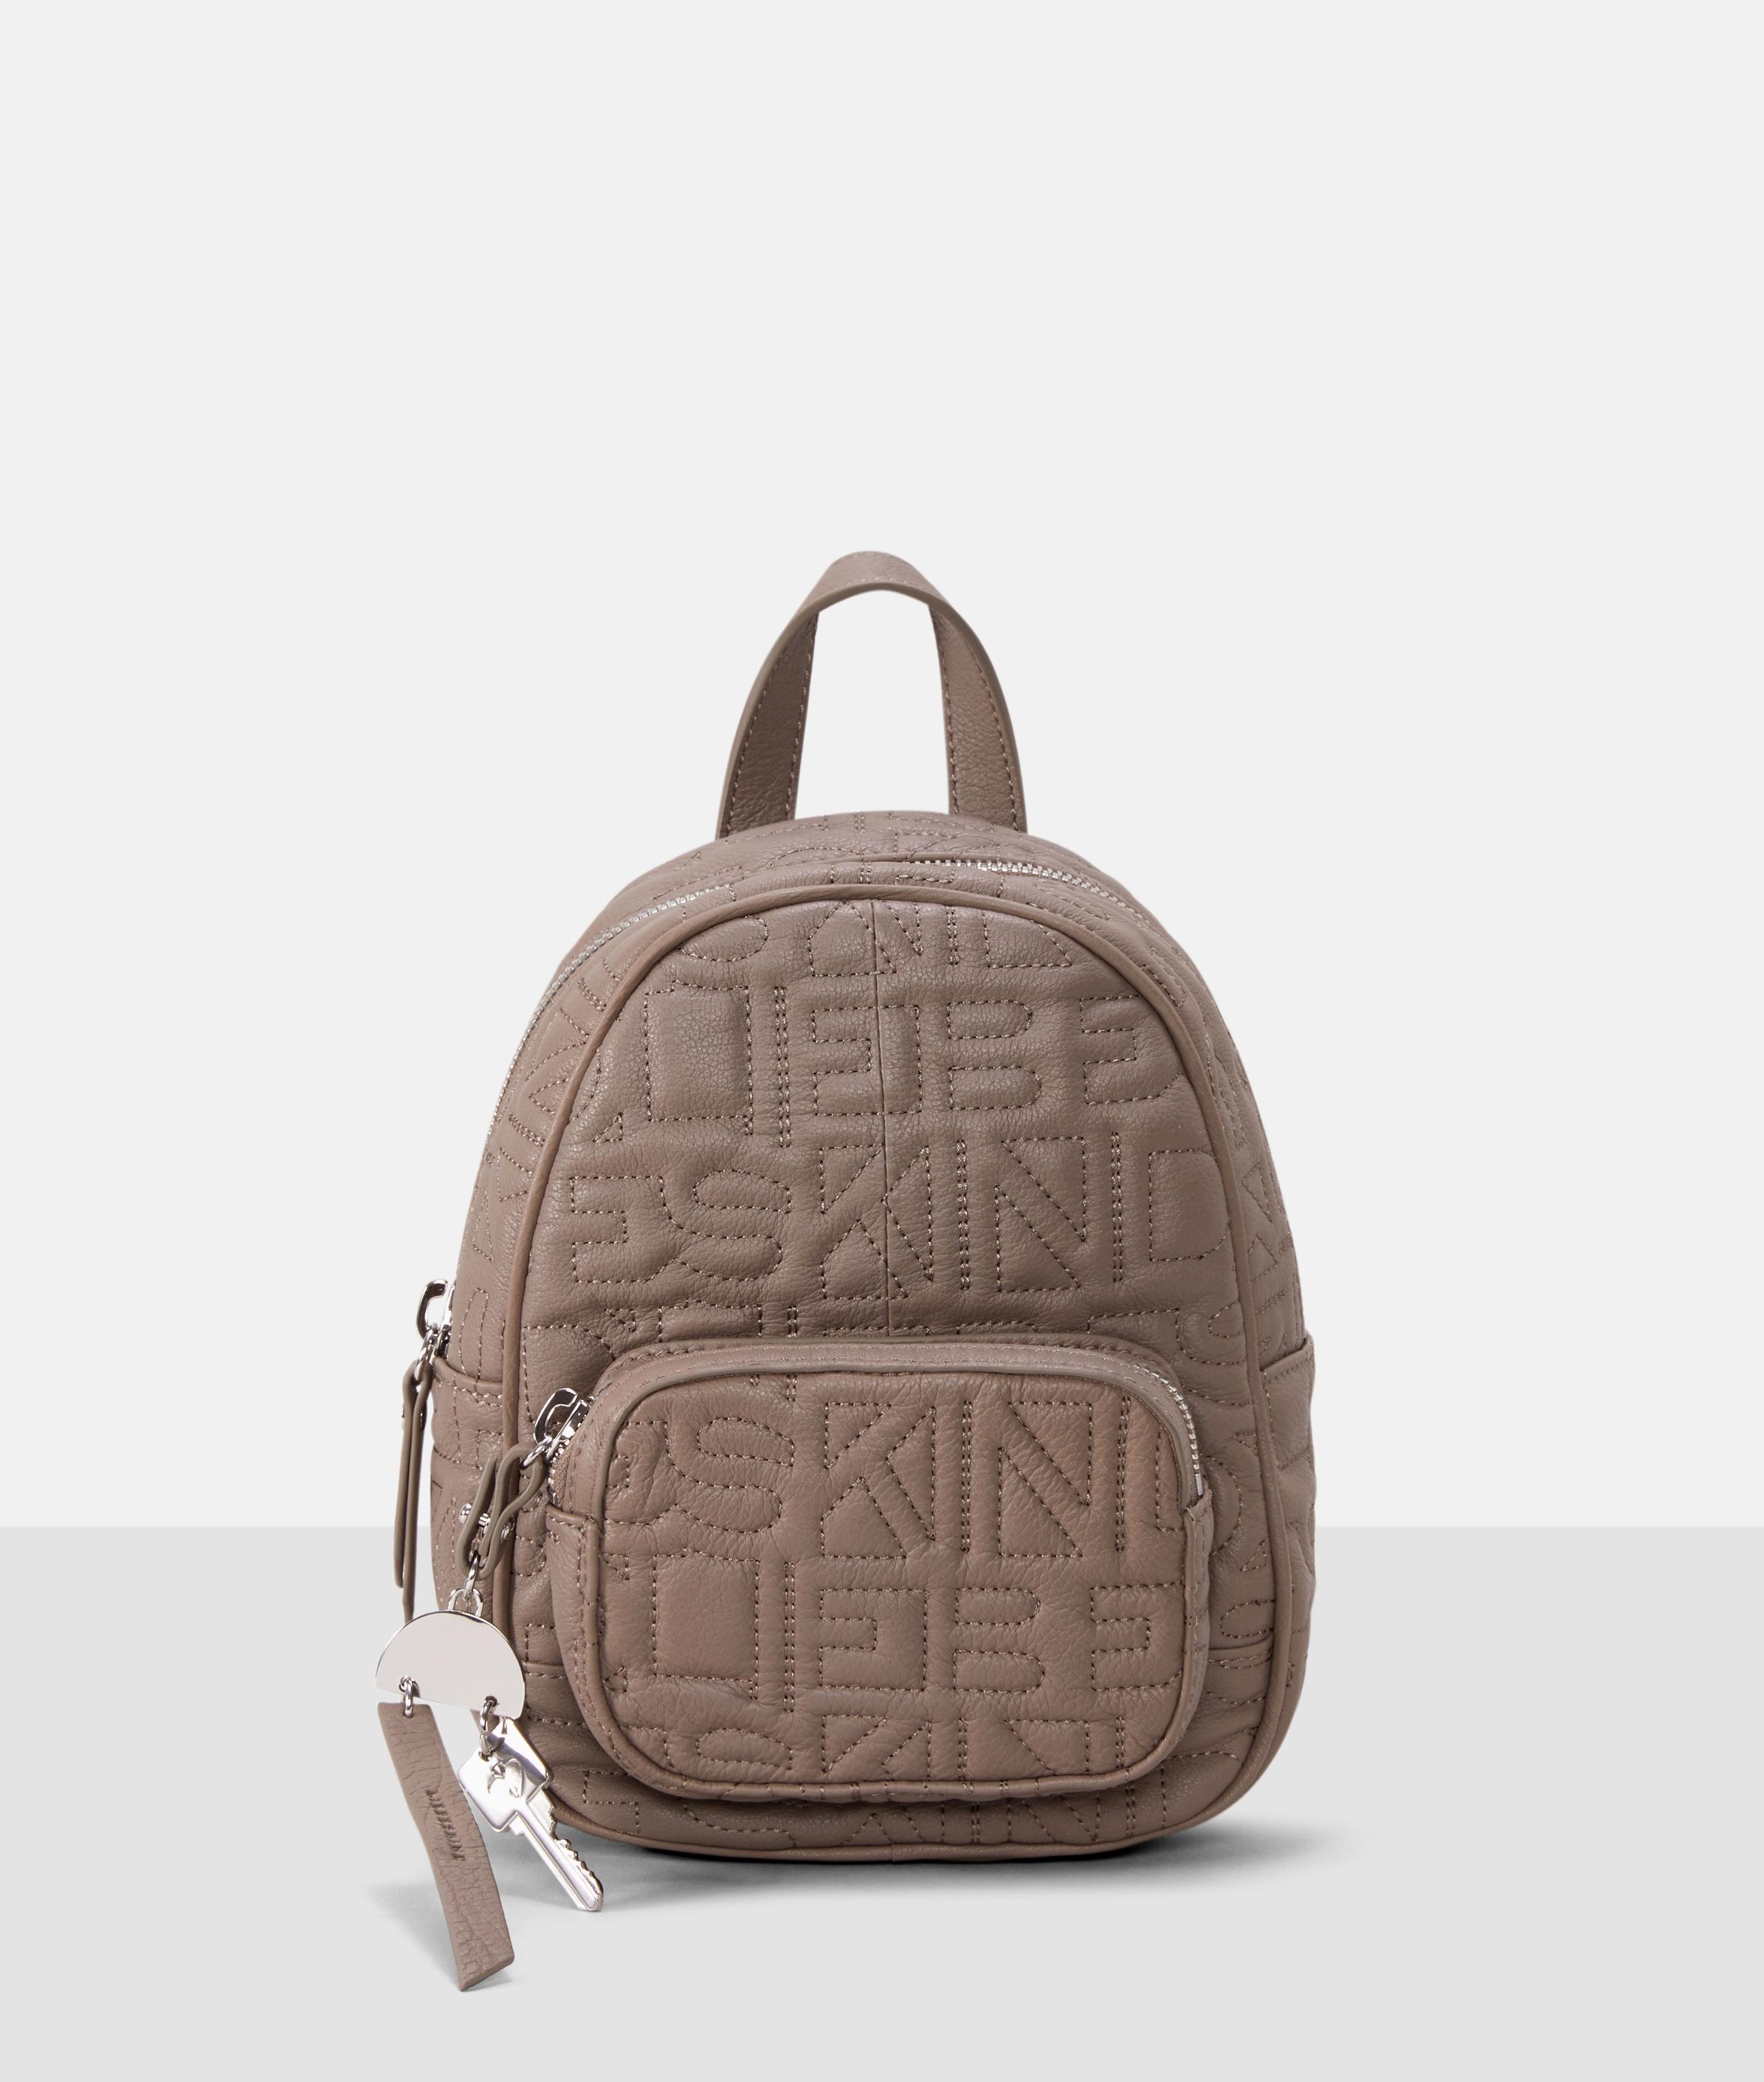 Berlin Tasche Urban Monogram Backpack S, Grau/Schwarz